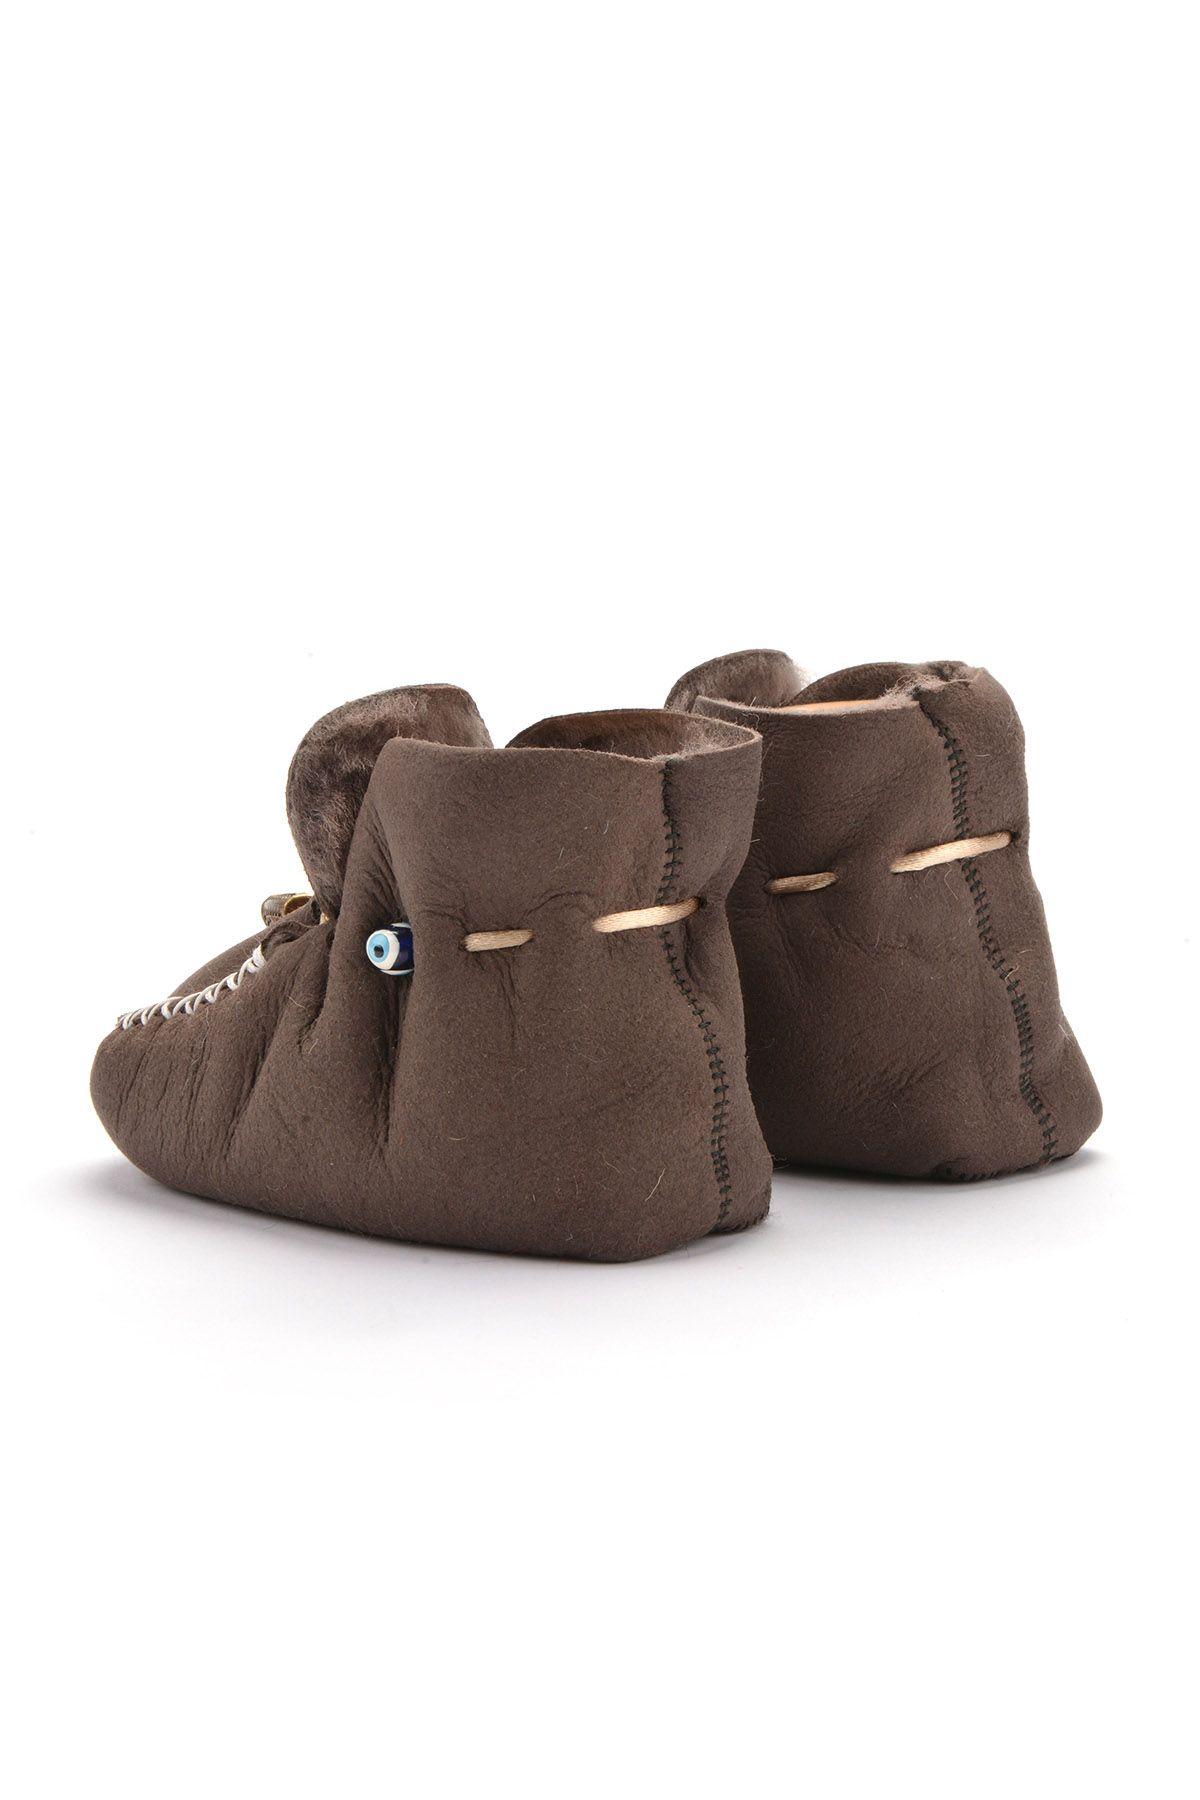 Pegia Laced Kids Booties From Genuine Fur Dark Brown